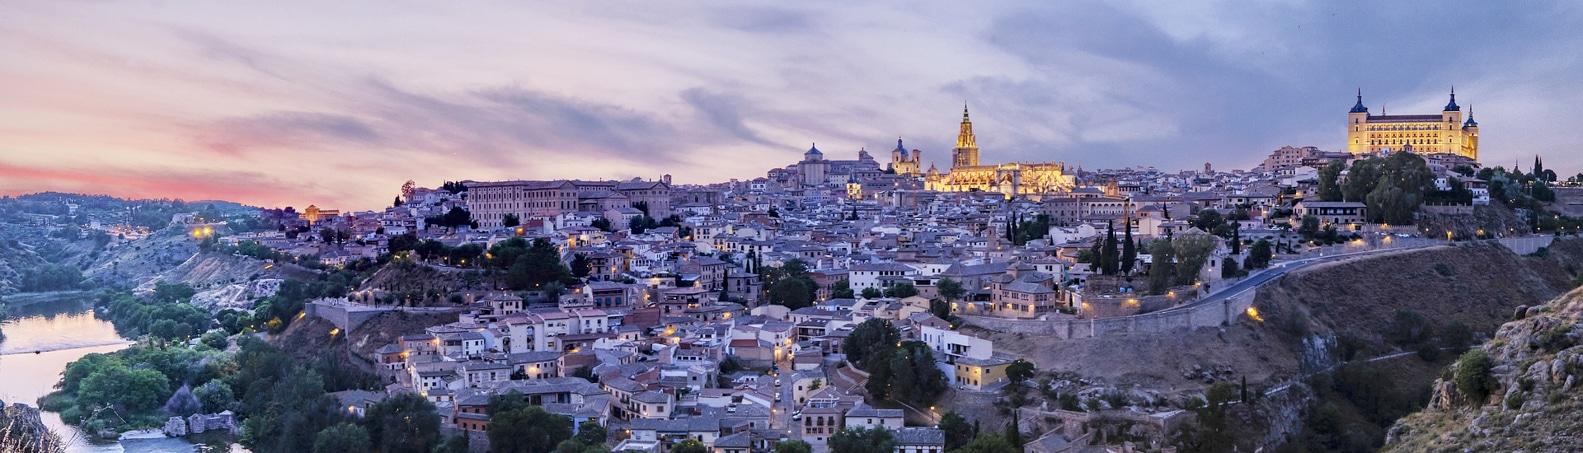 blog para viajar a españa